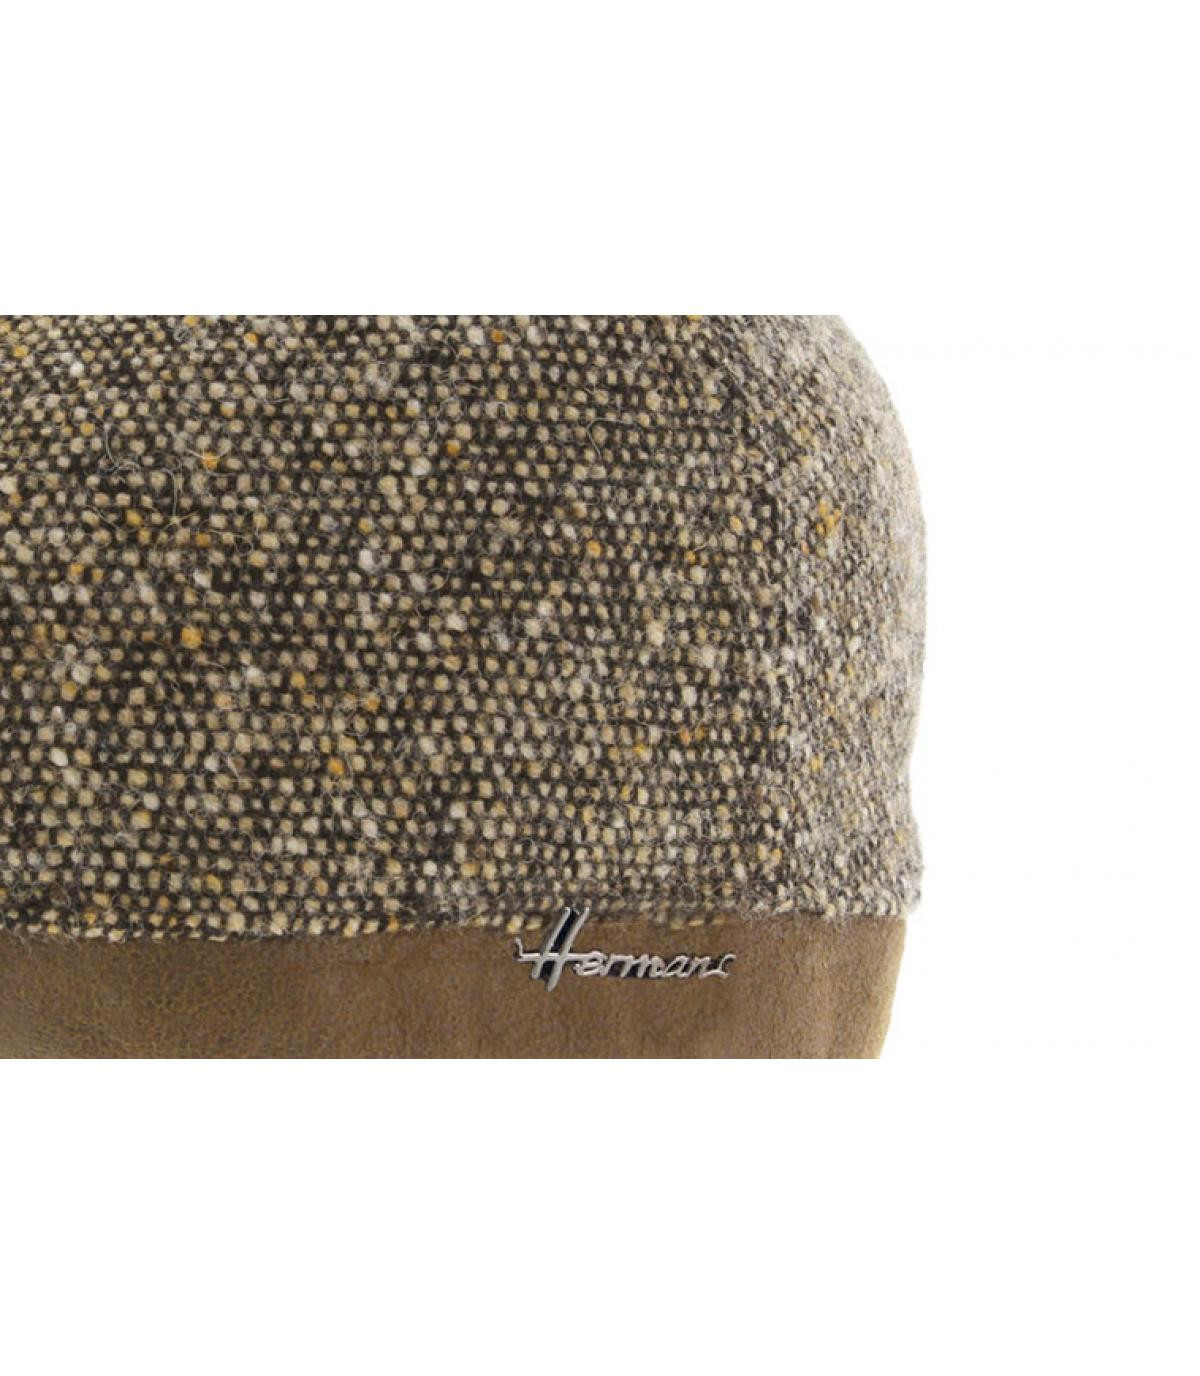 Details Range Wool taupe - afbeeling 3